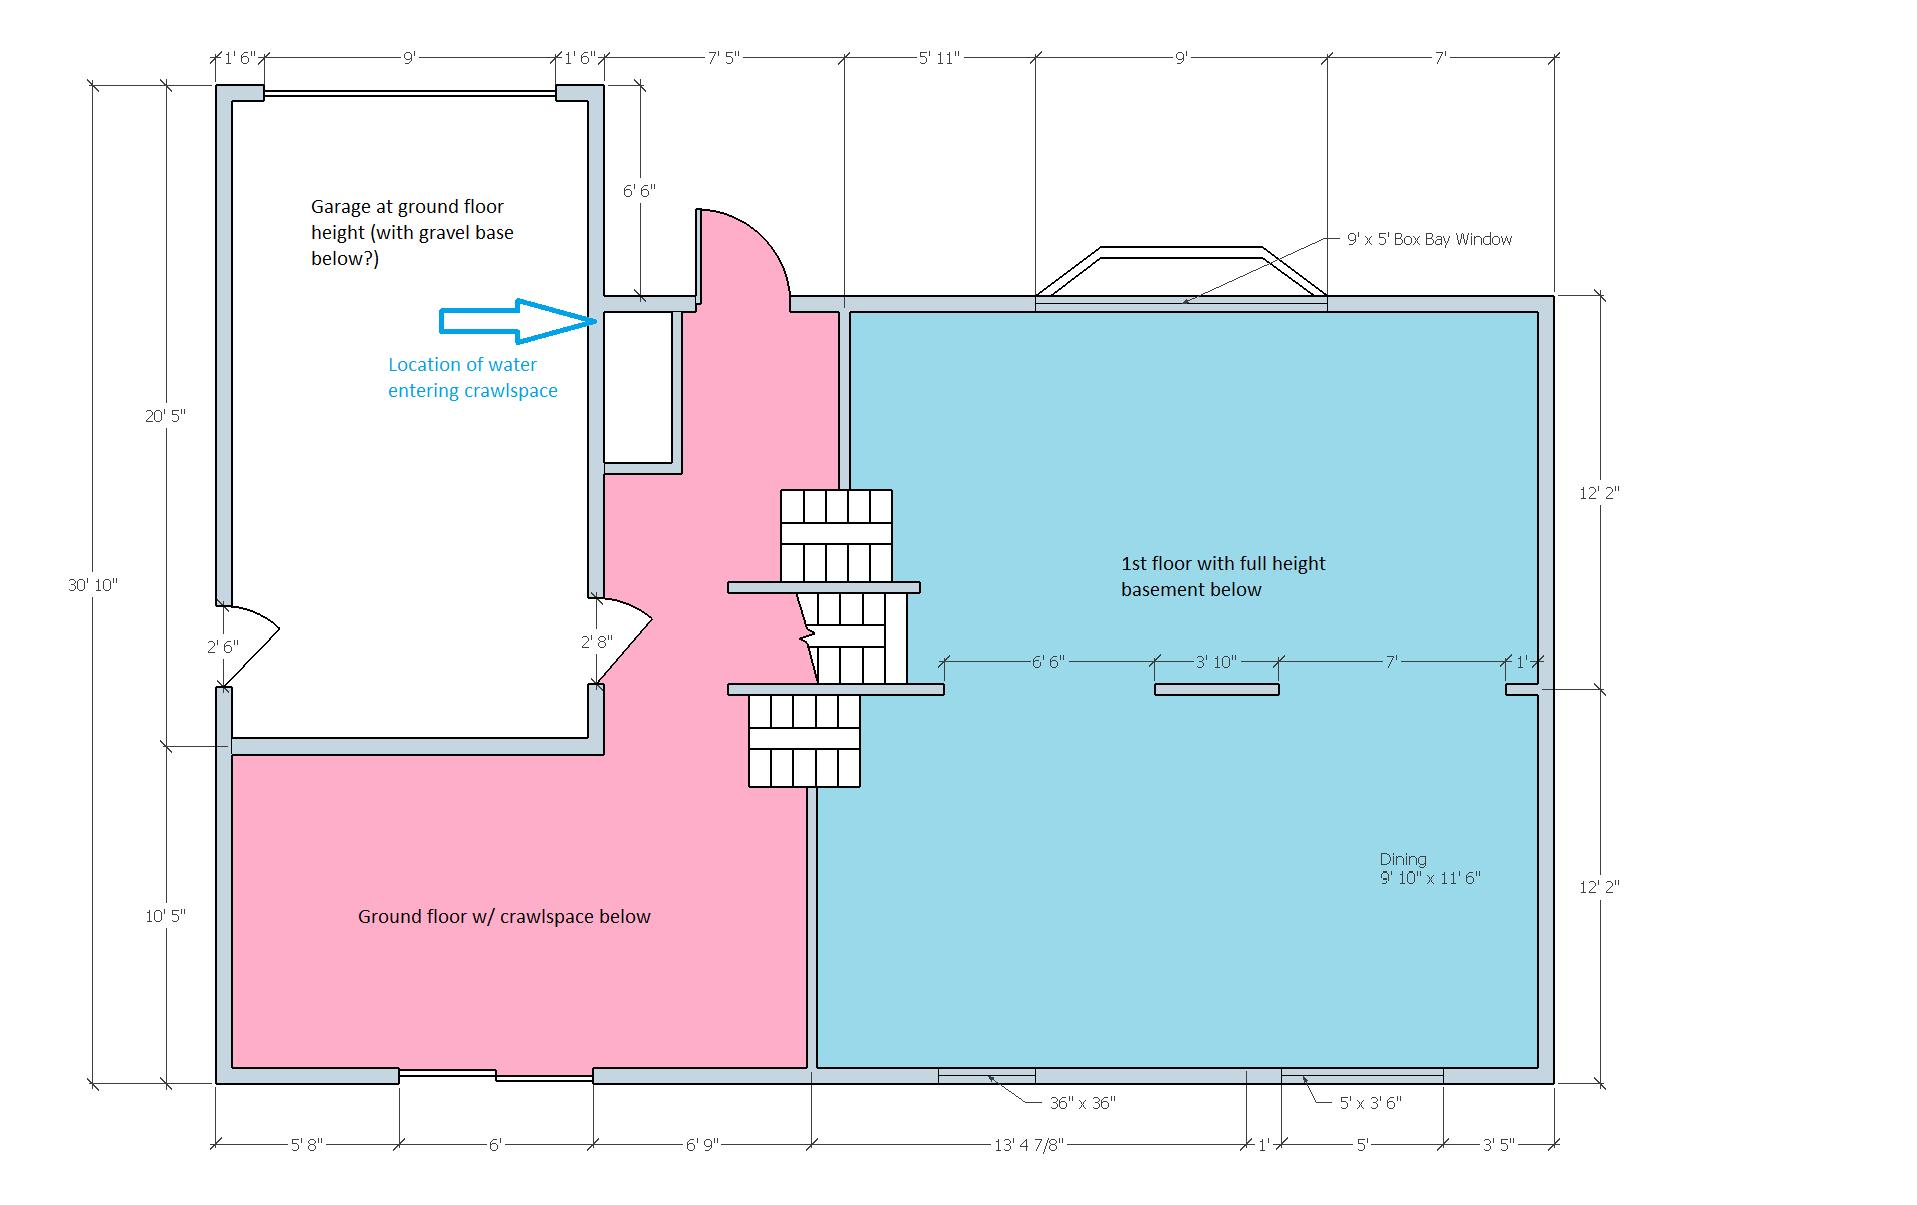 Repair Garage Threshold & Posts-planview.png